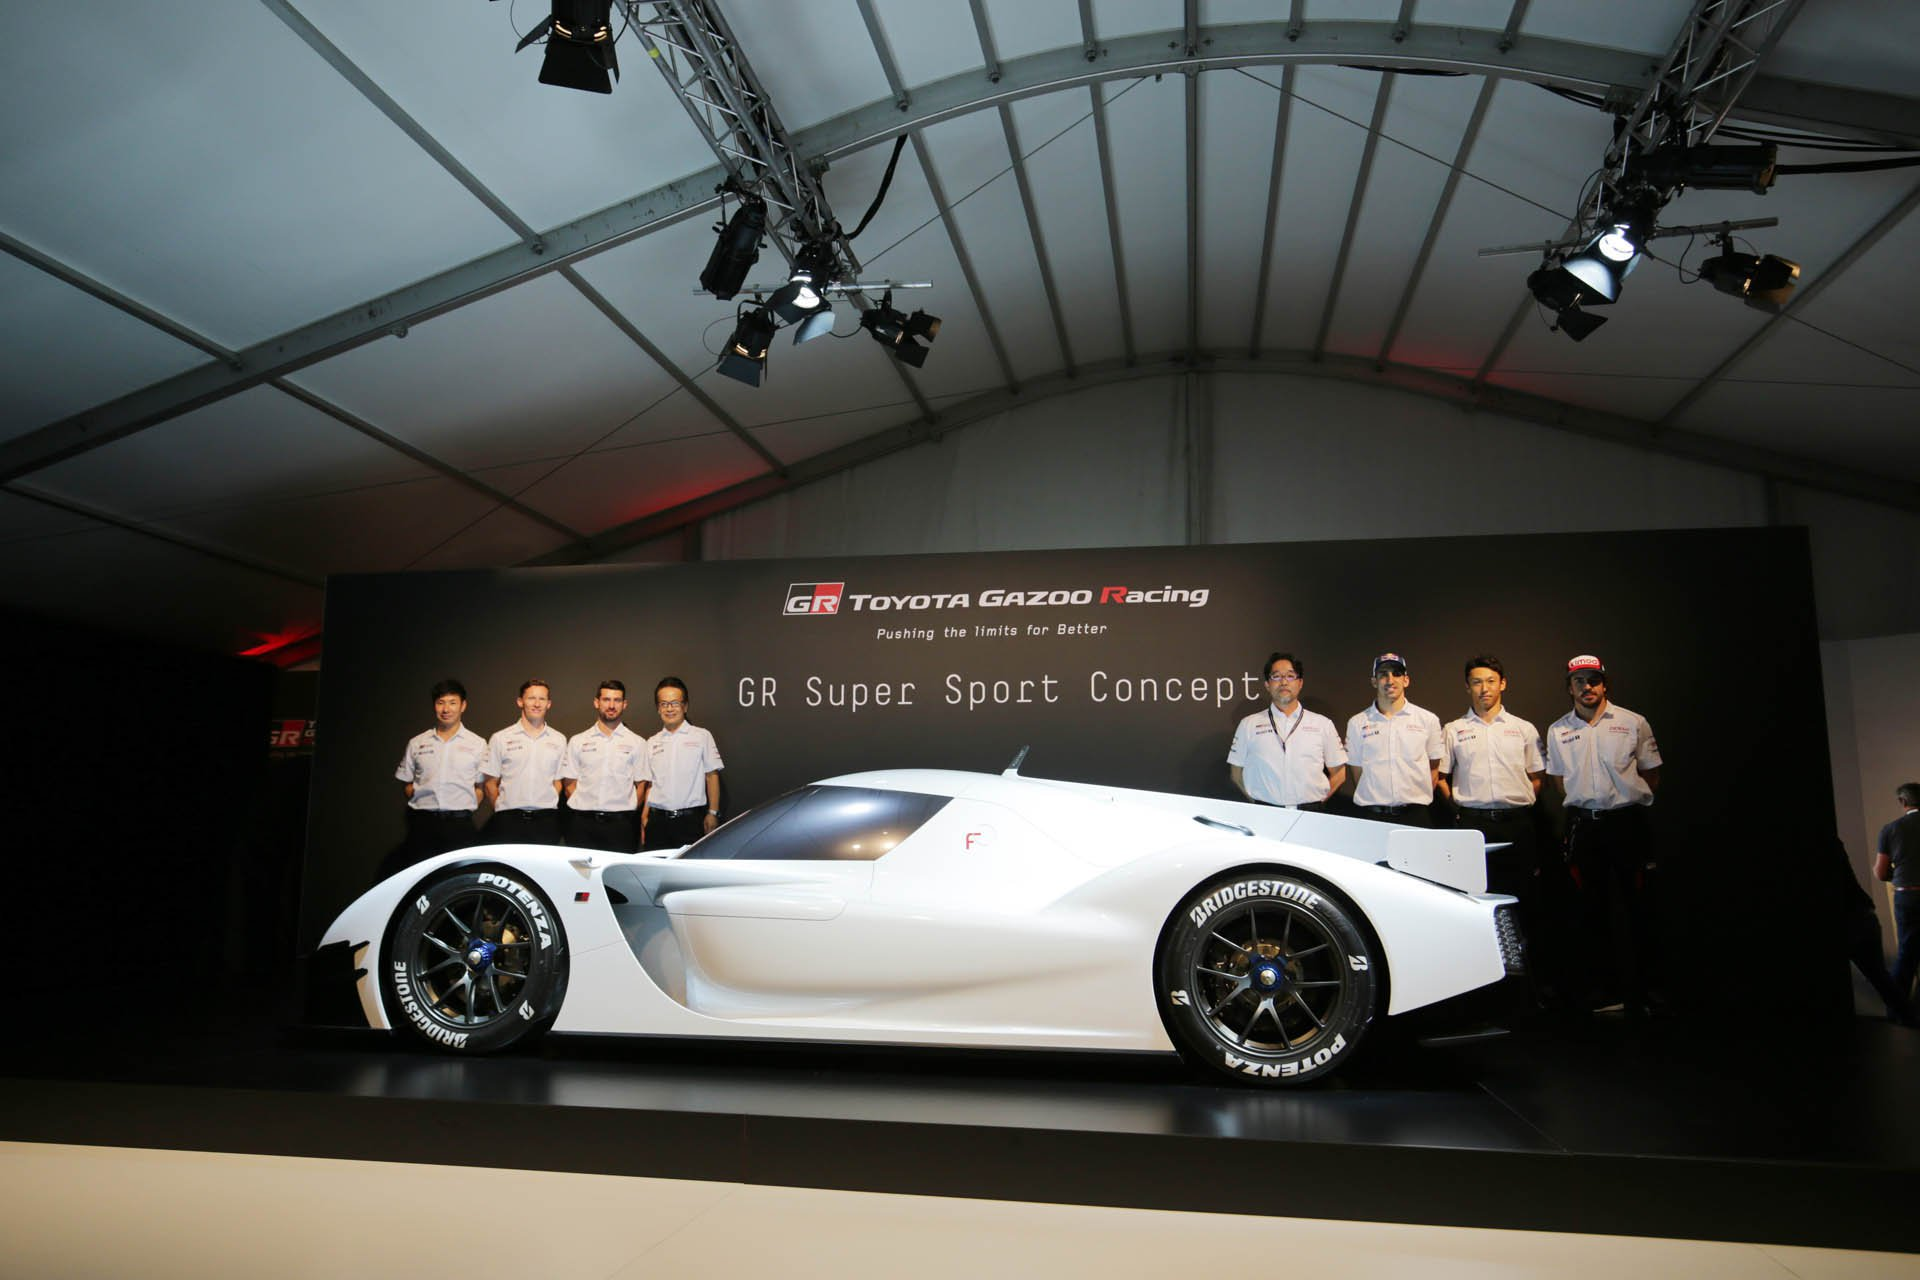 Toyota-xac-nhan-san-xuat-sieu-xe-anh-1